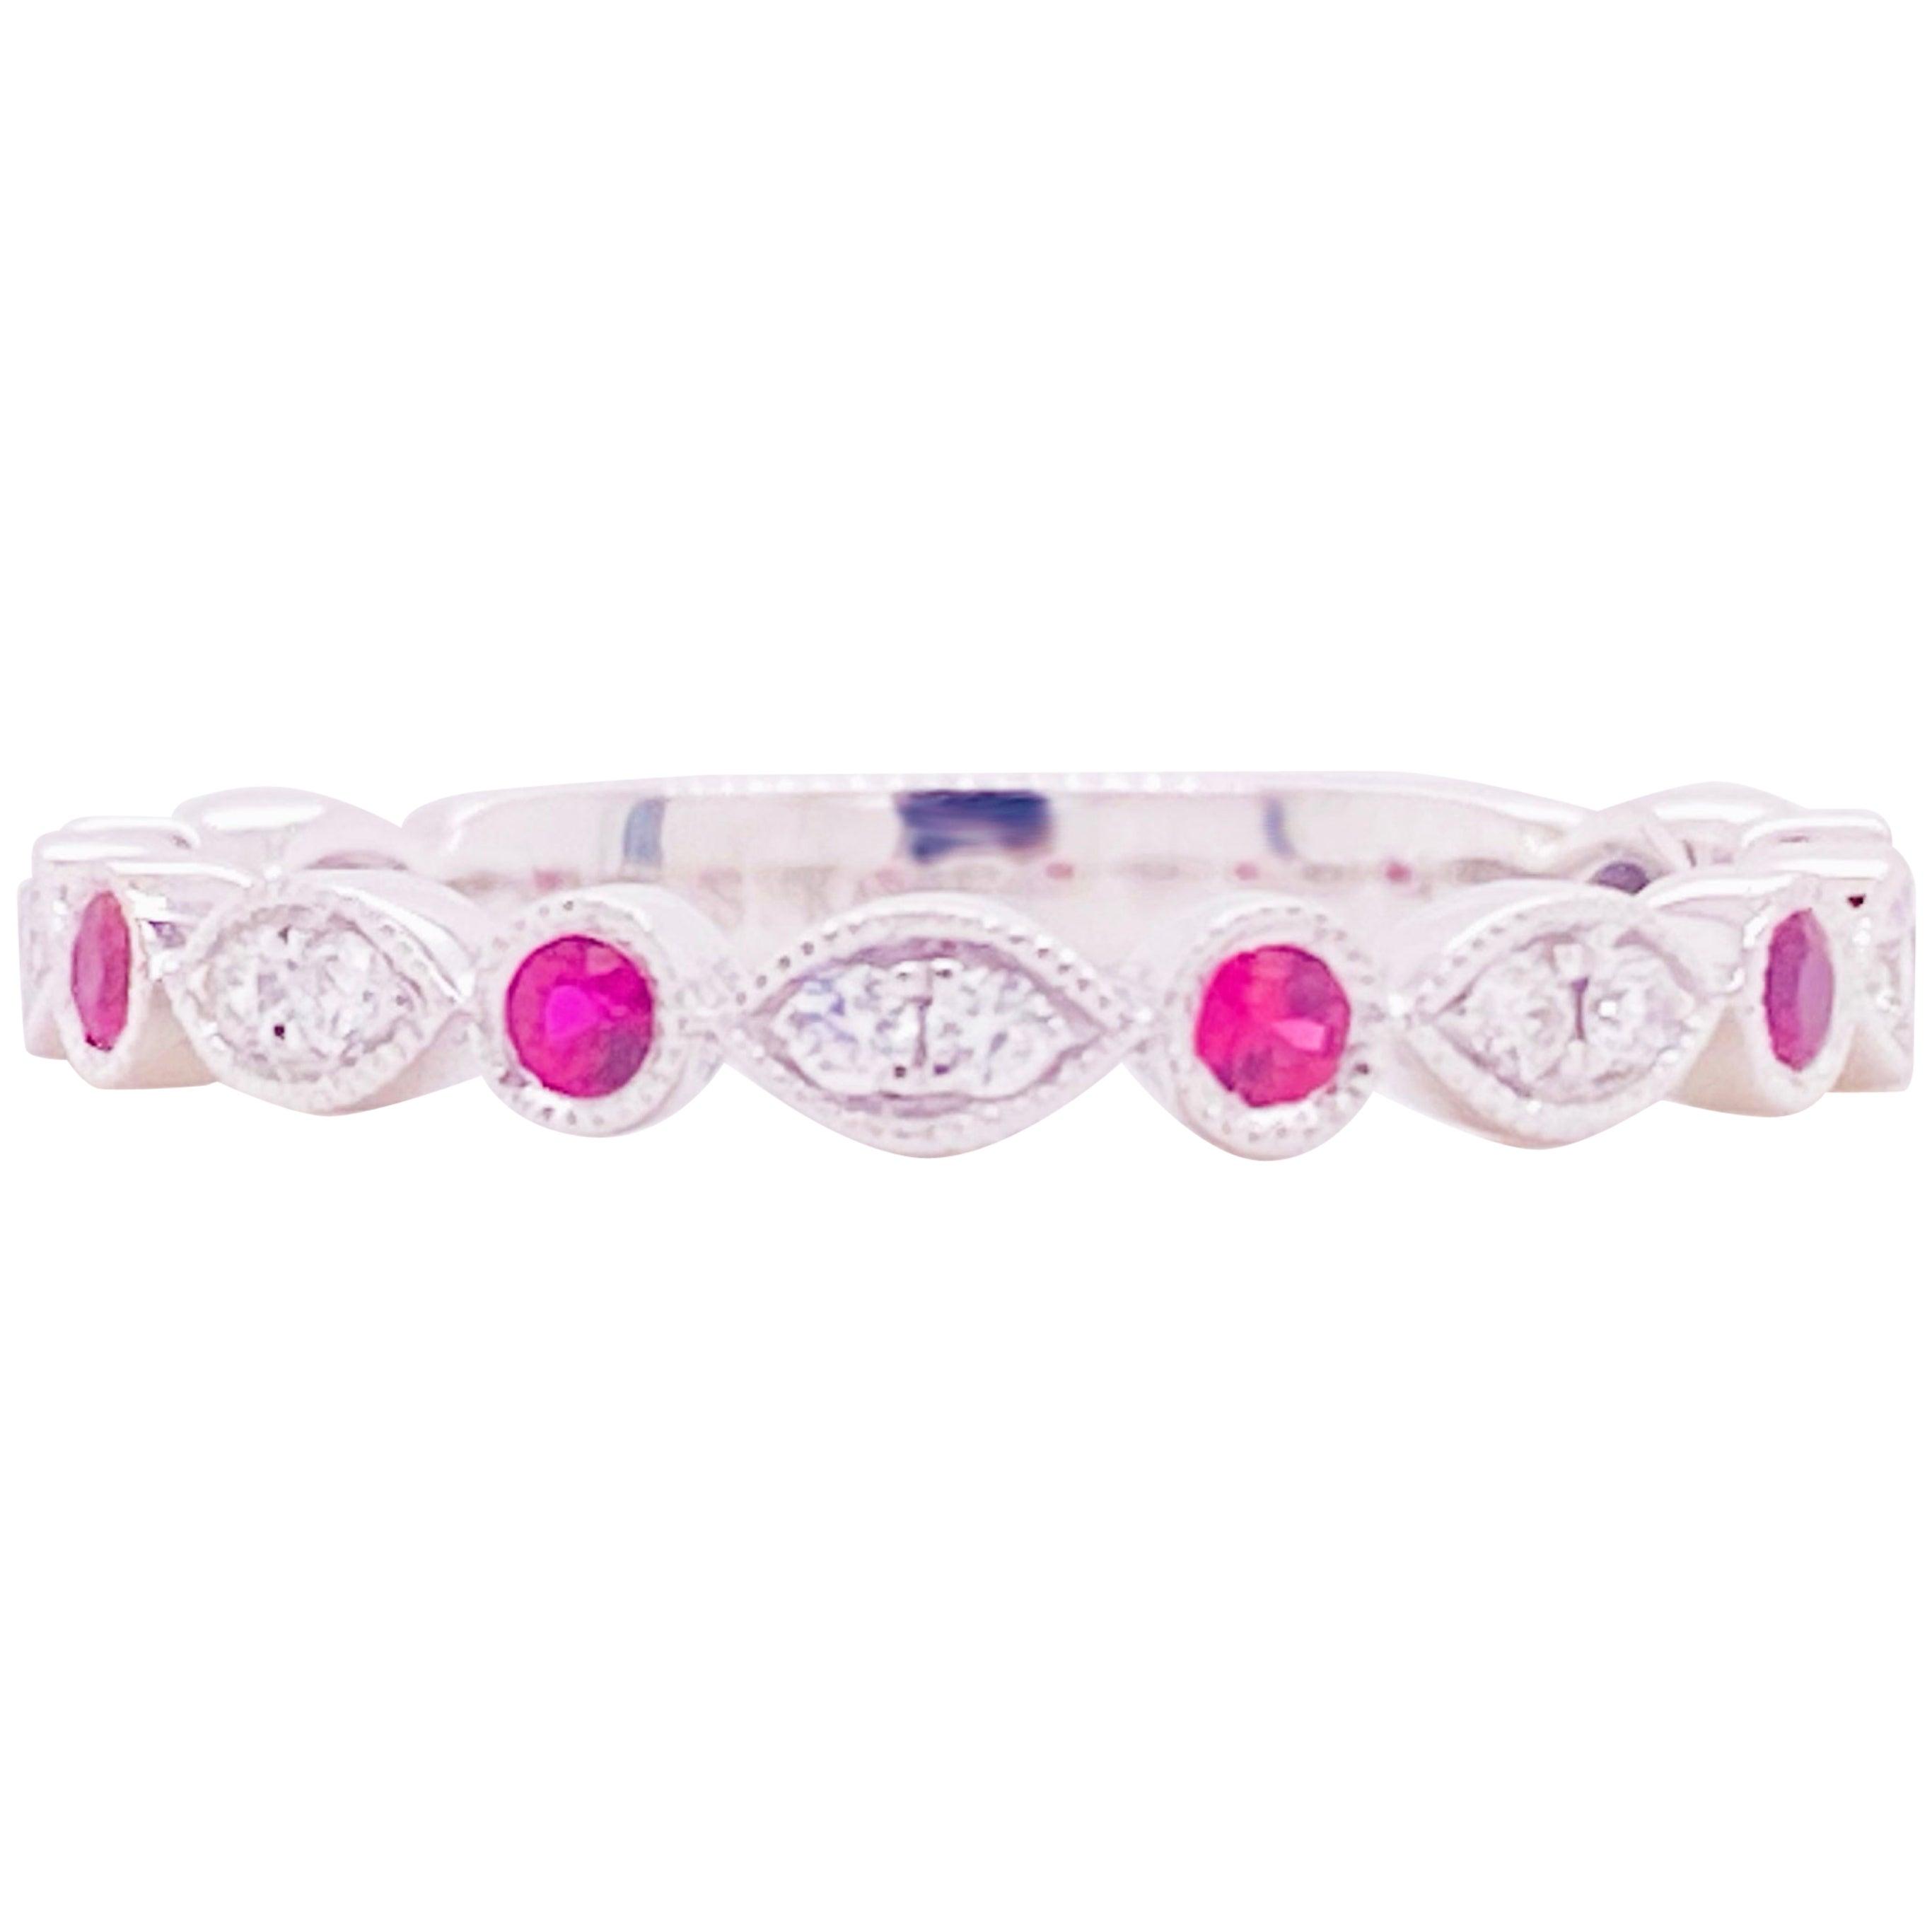 Ruby Diamond Ring, 14 Karat White Gold, Wedding Band, Stackable Band